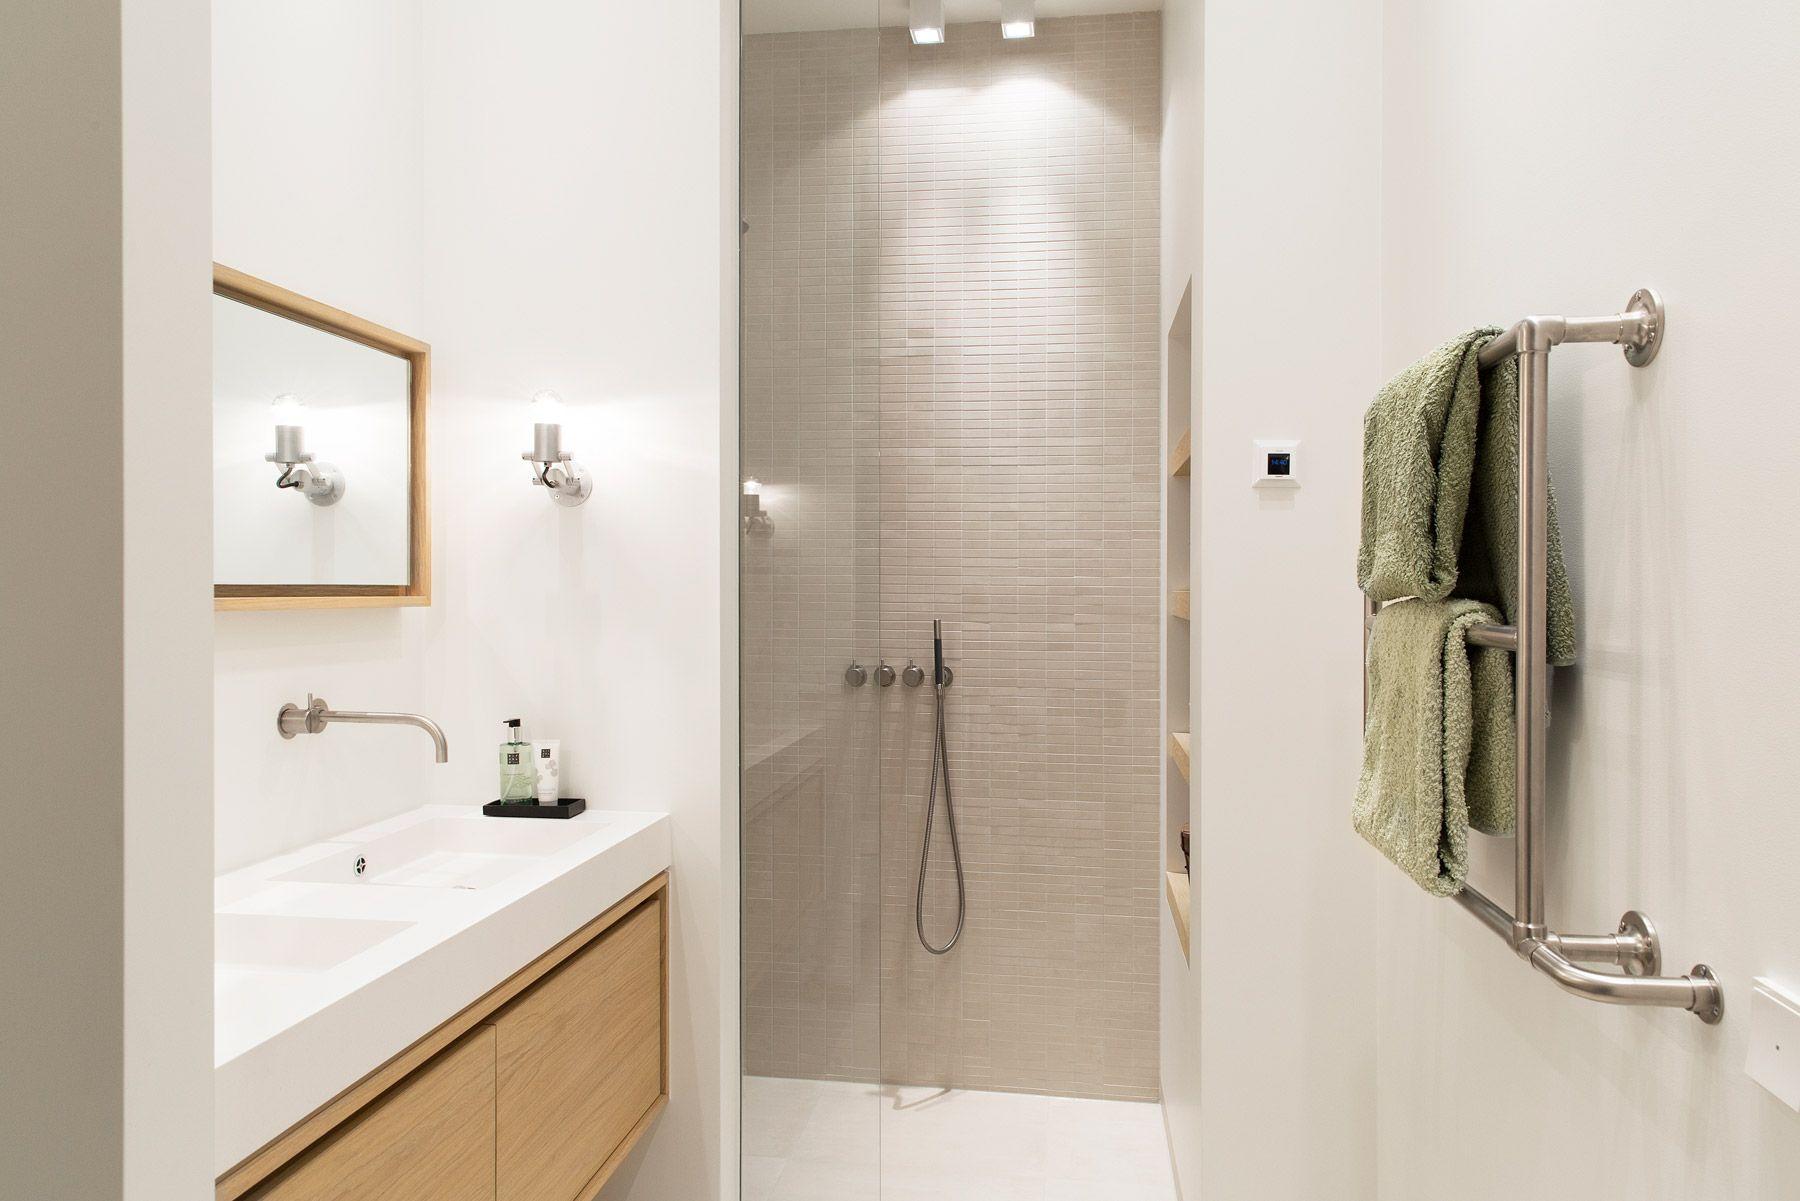 Badkamer Verbouwen Amsterdam : Frisse lichte badkamer in amsterdam monument. het woningontwerp werd